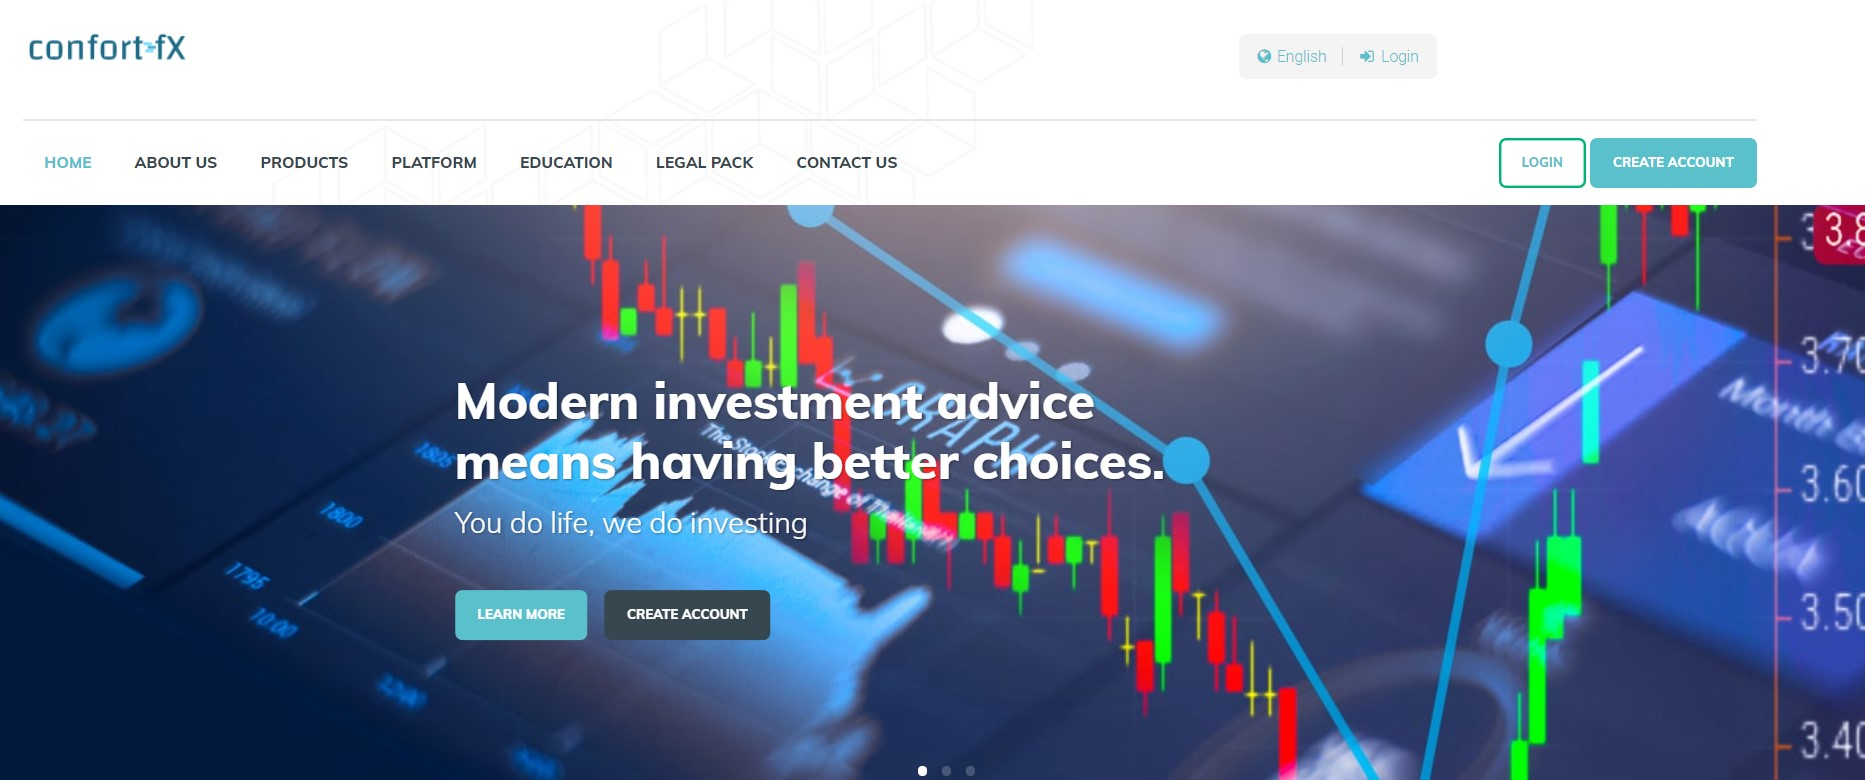 ConfortFX website